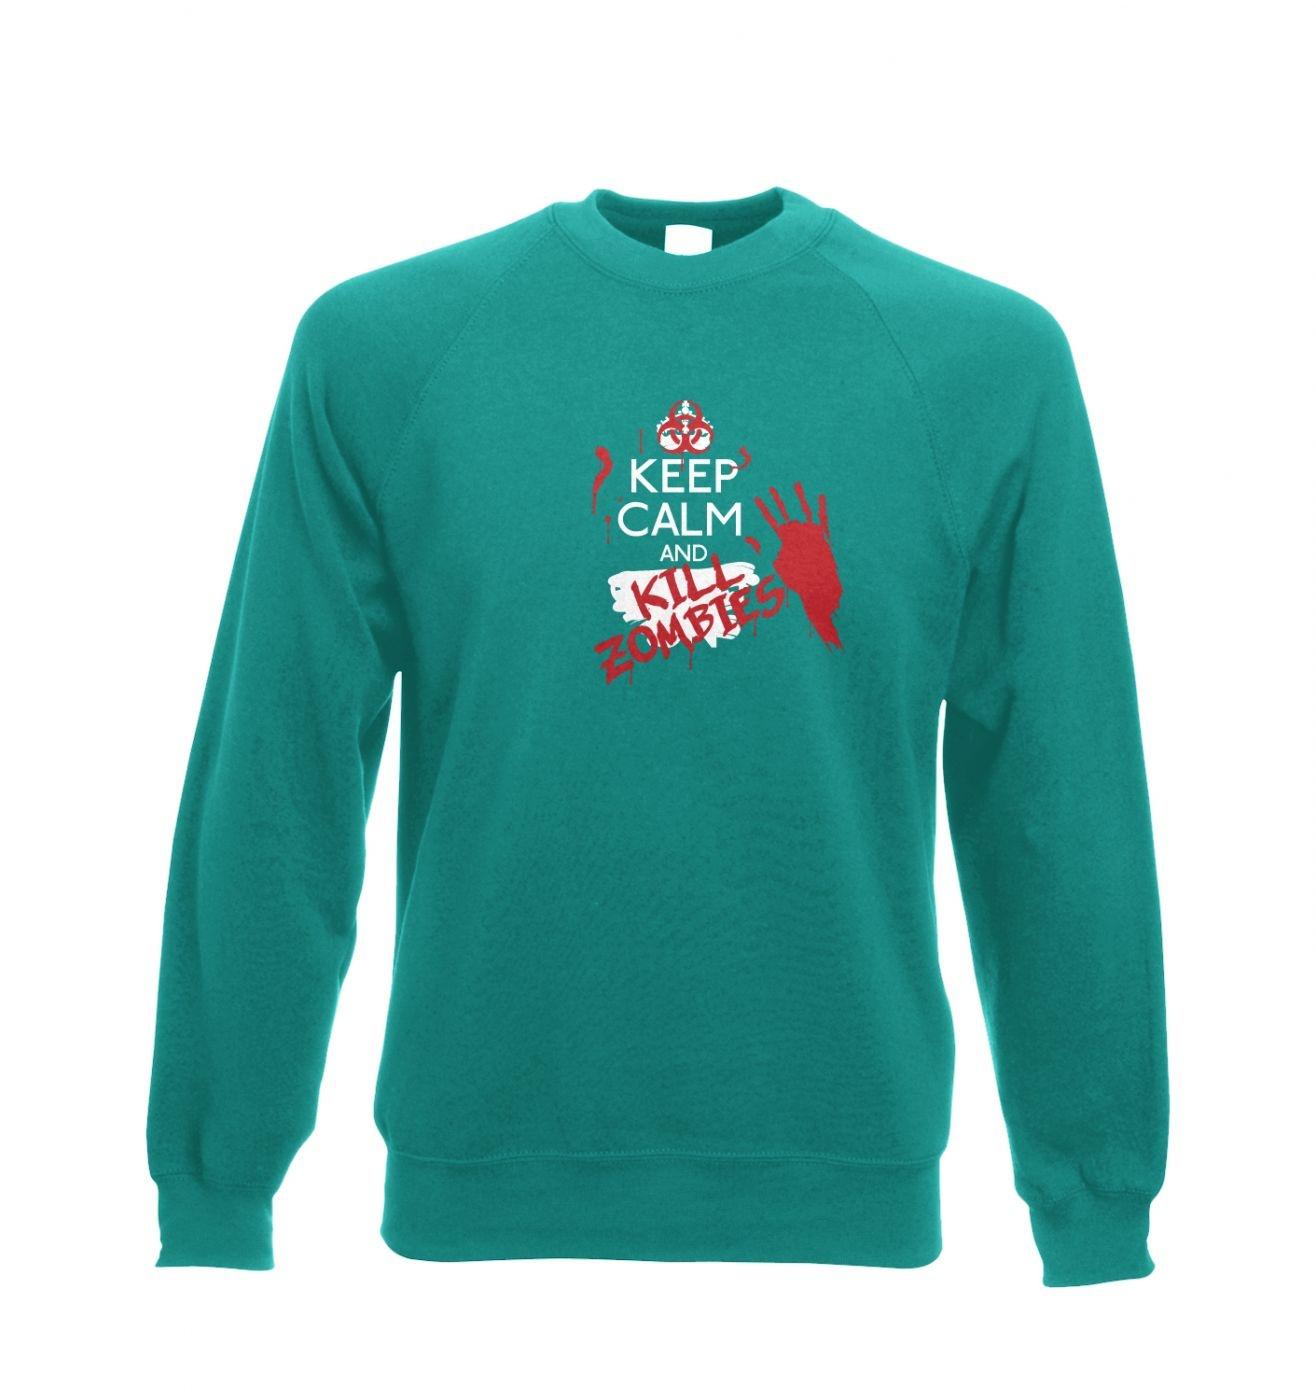 Keep Calm And Kill Zombies adult's crewneck sweatshirt